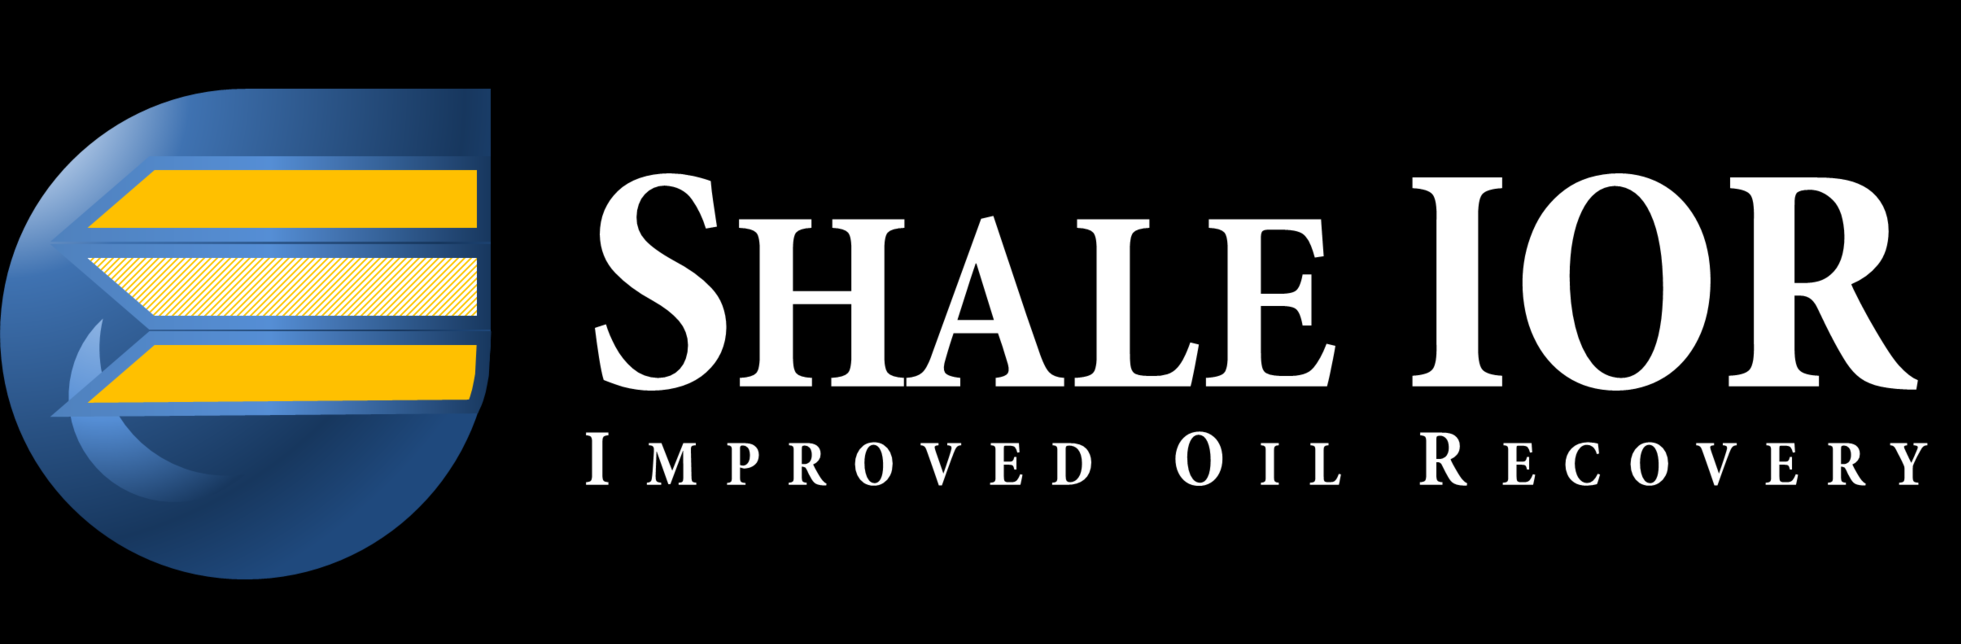 ShaleIOR_white (2).png